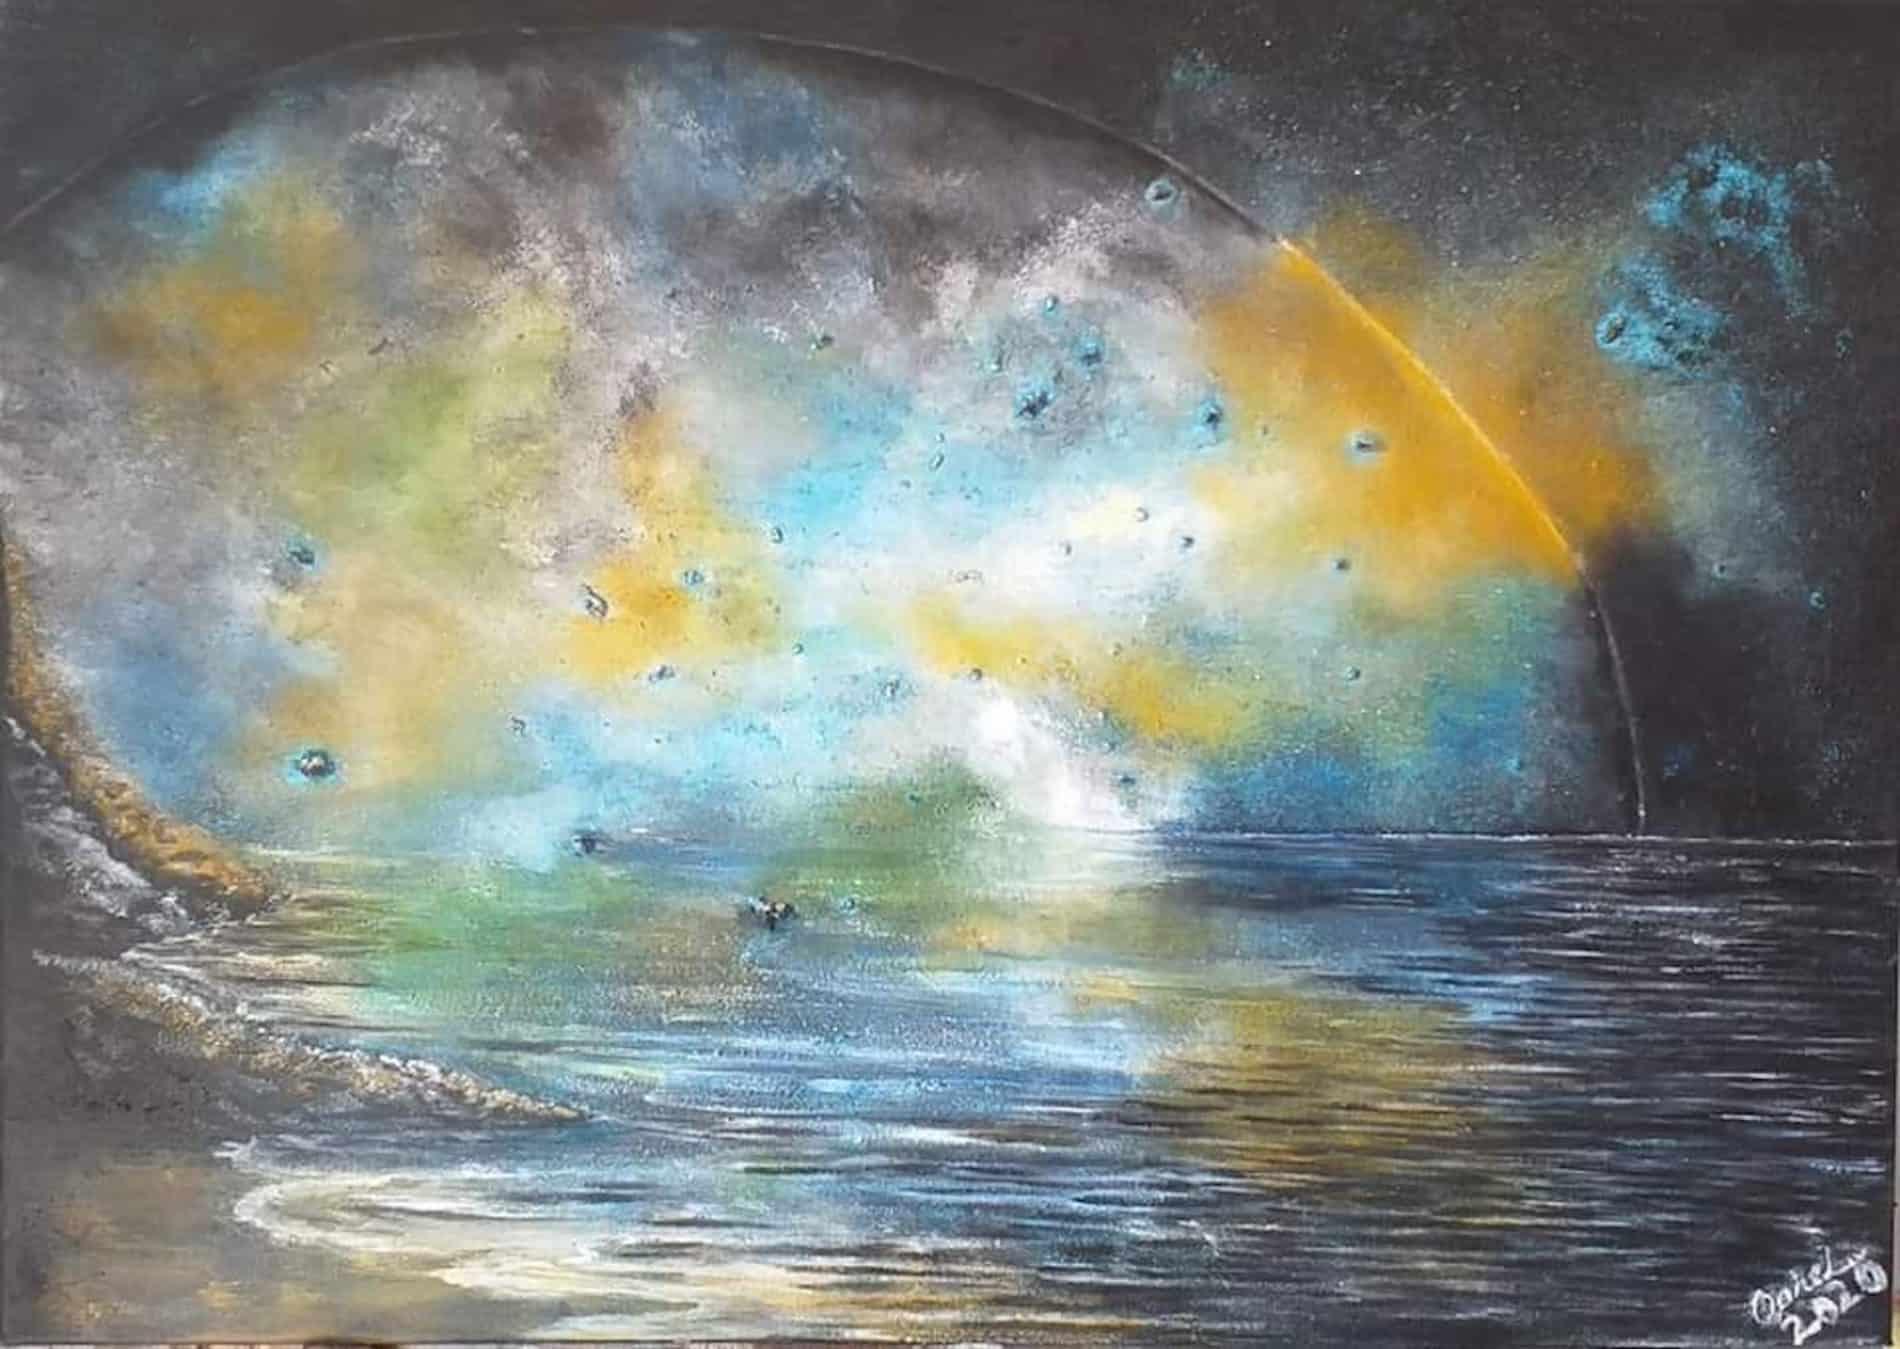 mauritian-artist-kariine-boodiah-rebirth-of-mind